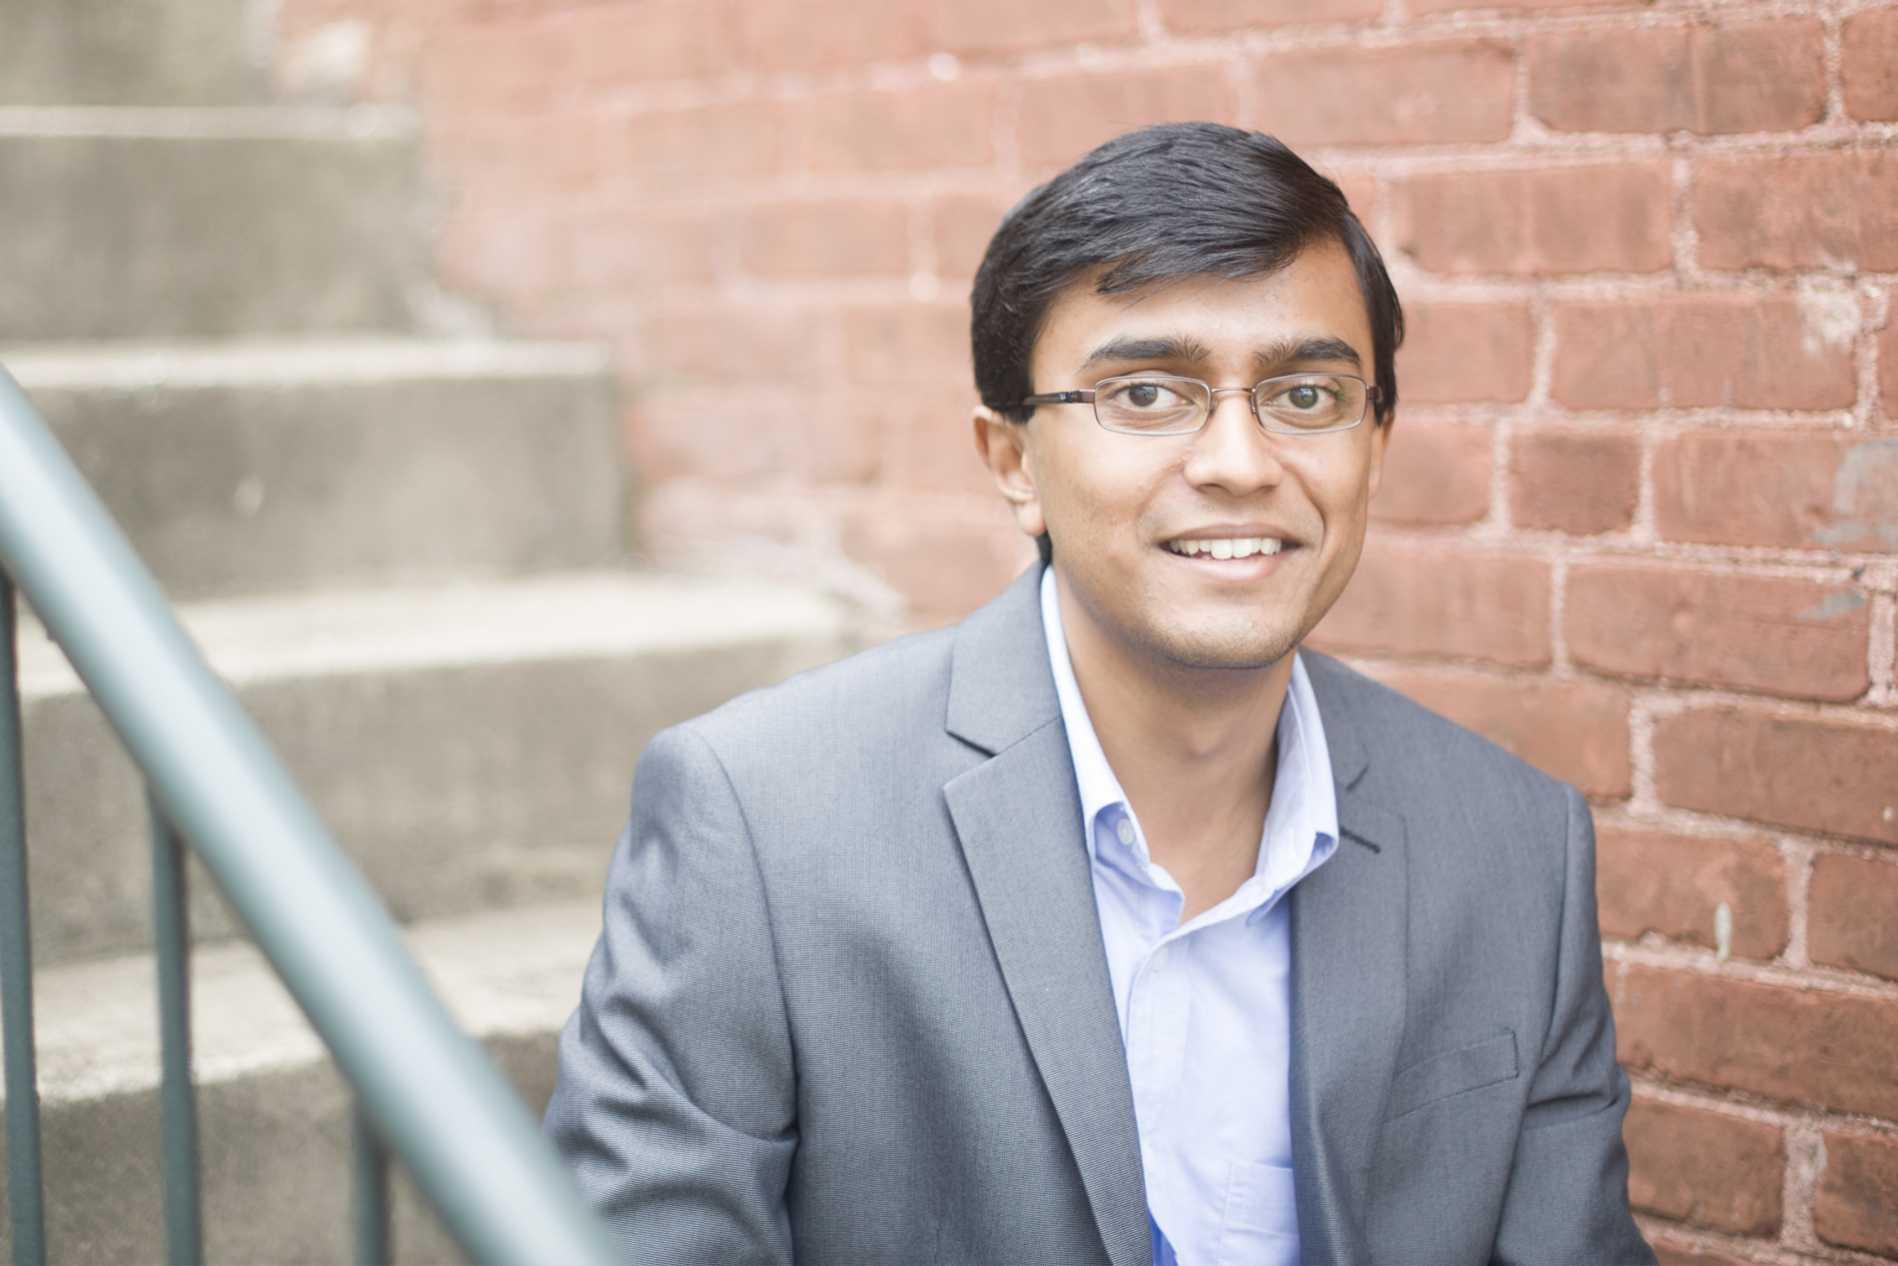 Kunal T. Patel